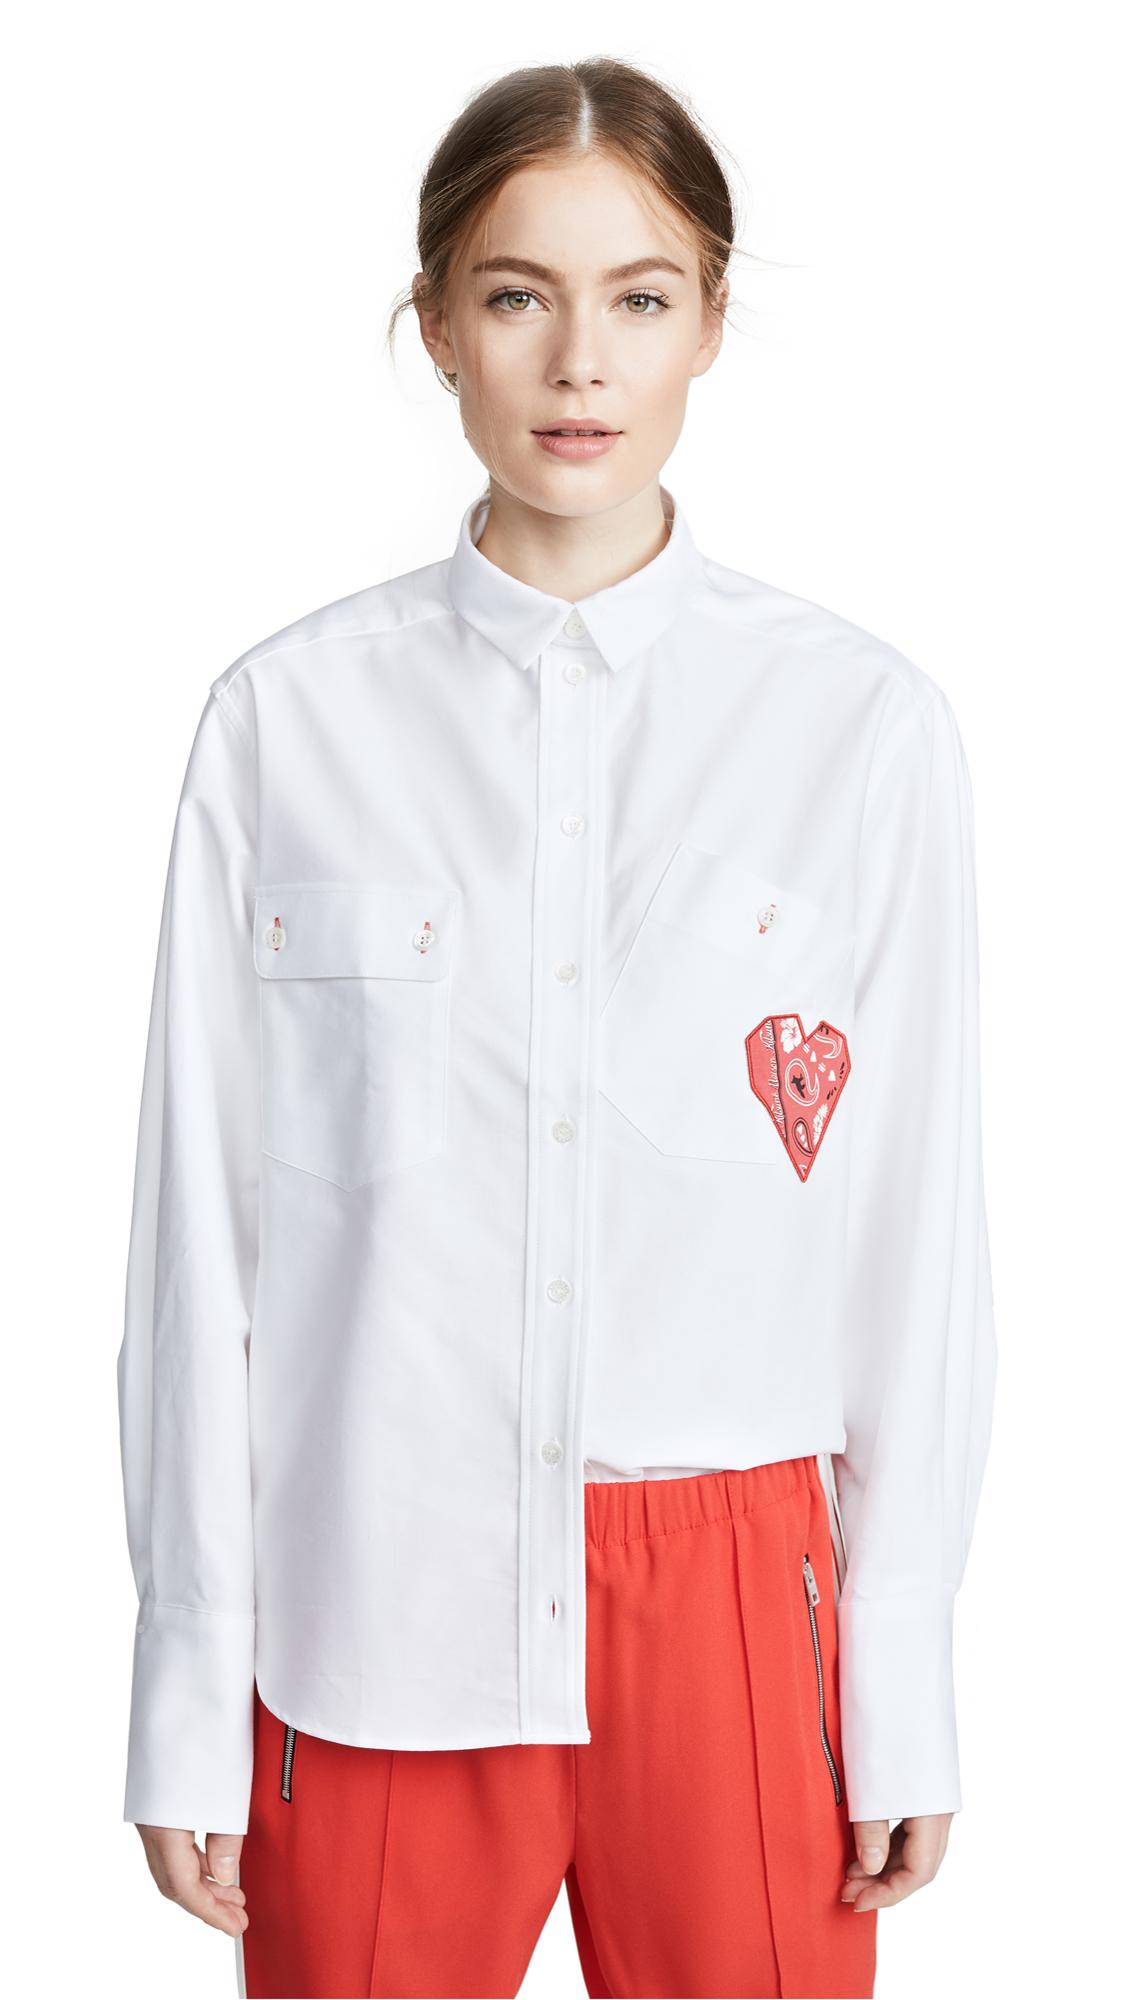 Maison Kitsune Verona Button Down Shirt In White